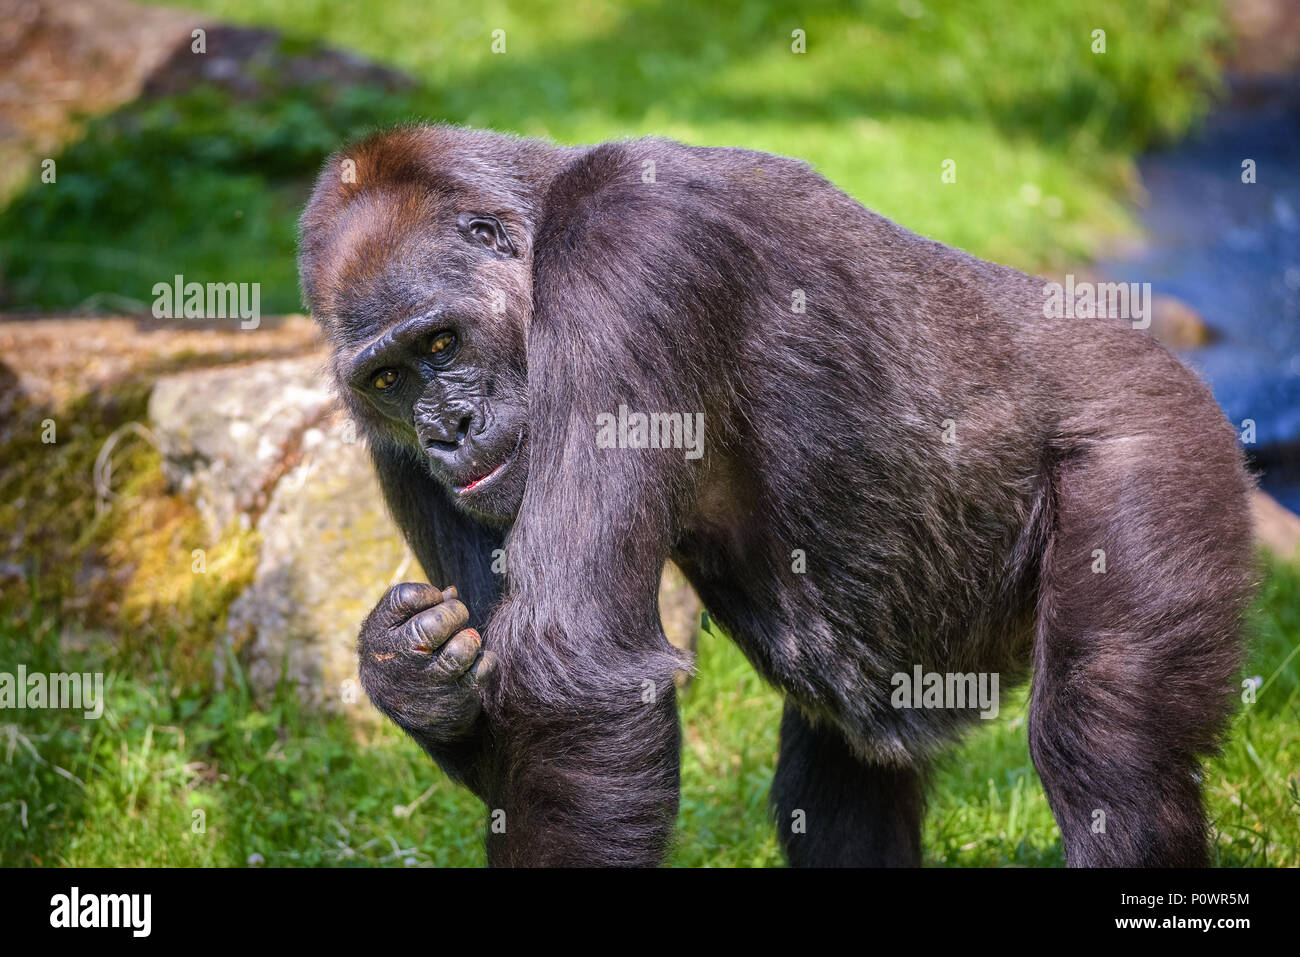 Portrait Of A Big Western Lowland Gorilla